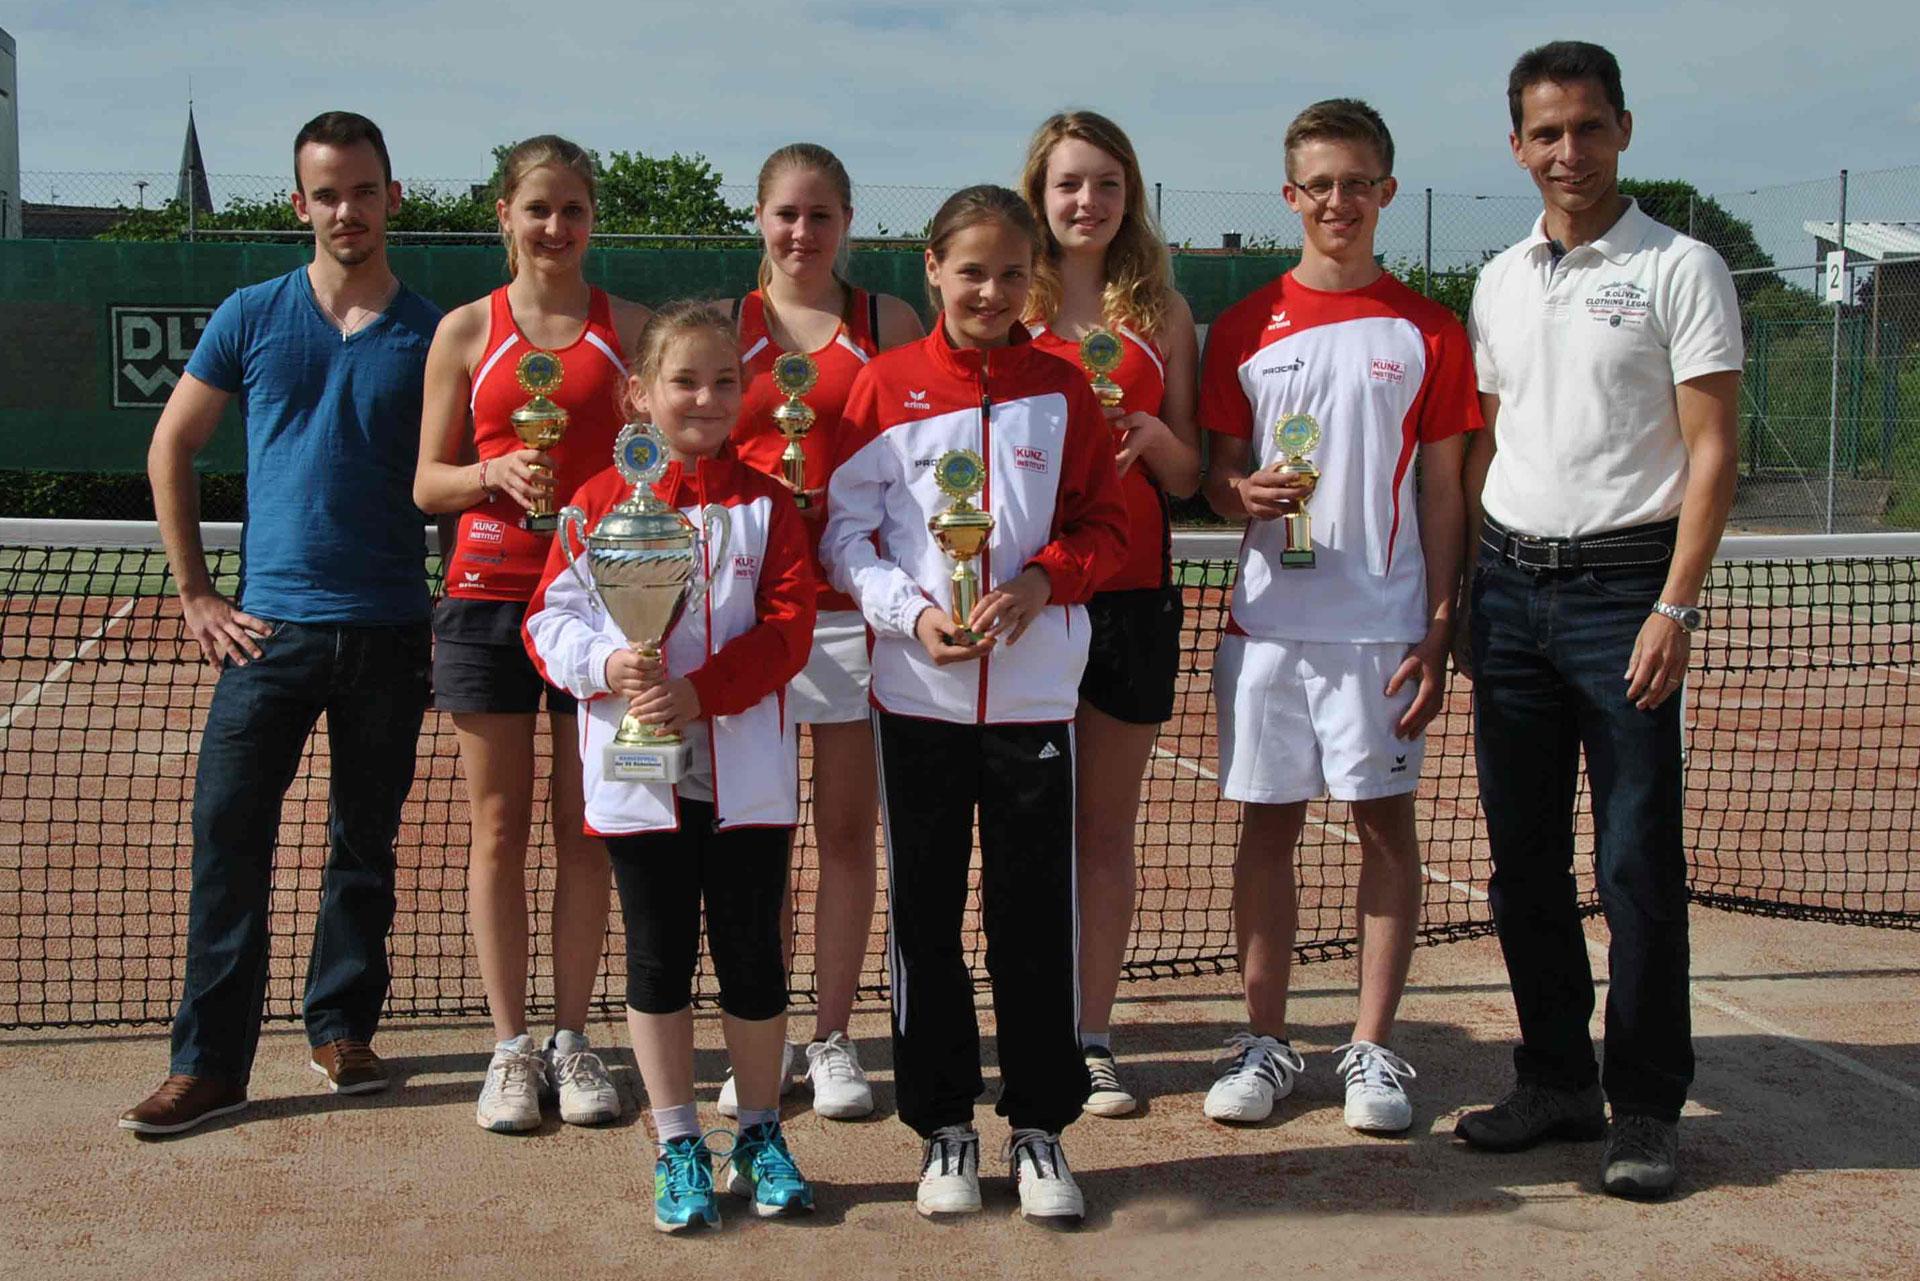 Bambini - Tennisabteilung des TUS Gutenberg